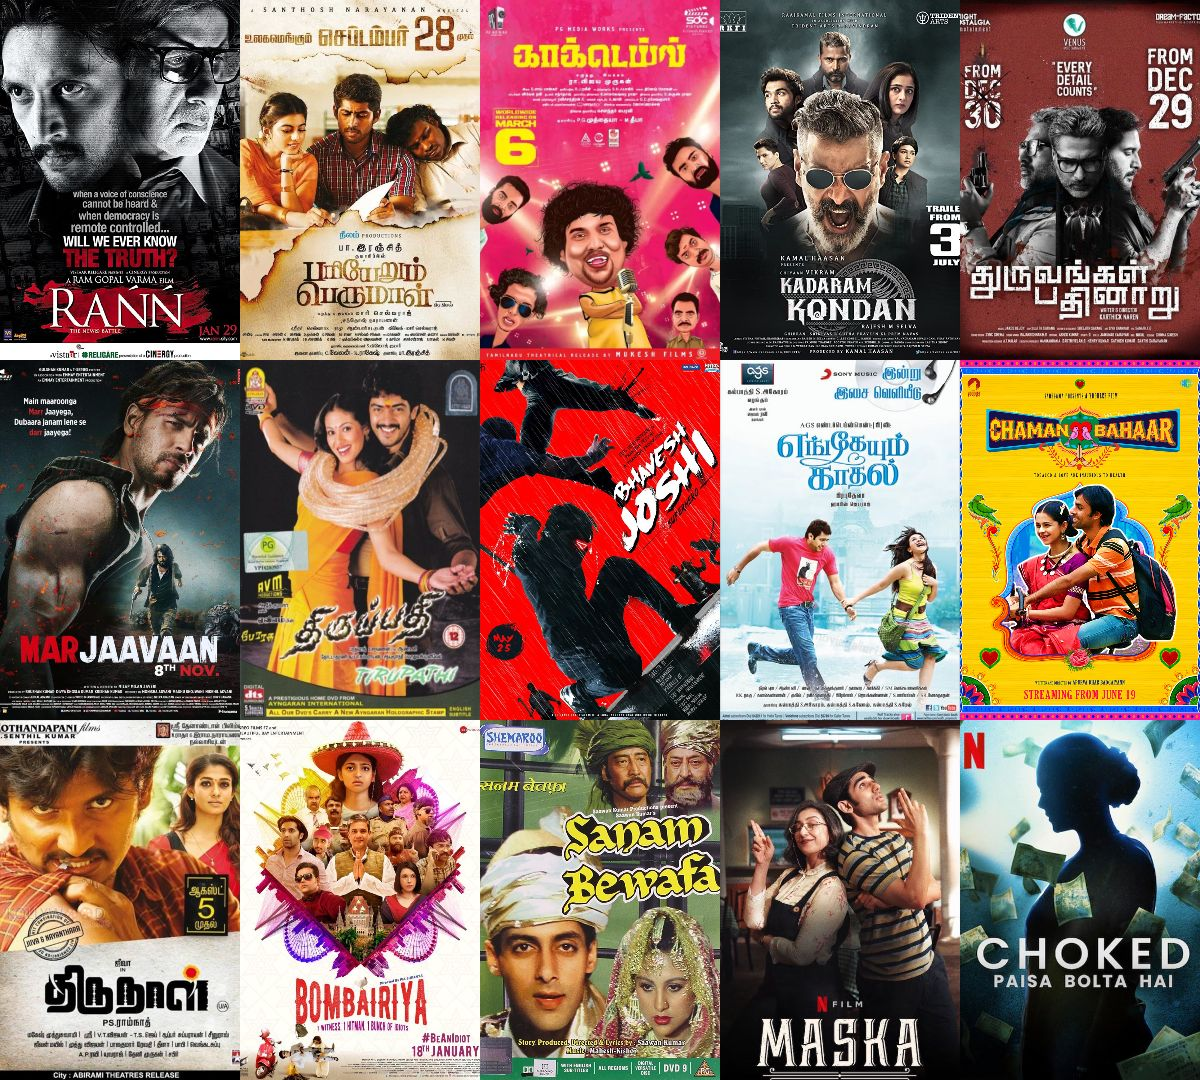 f:id:komeindiafilm:20200801090747j:plain